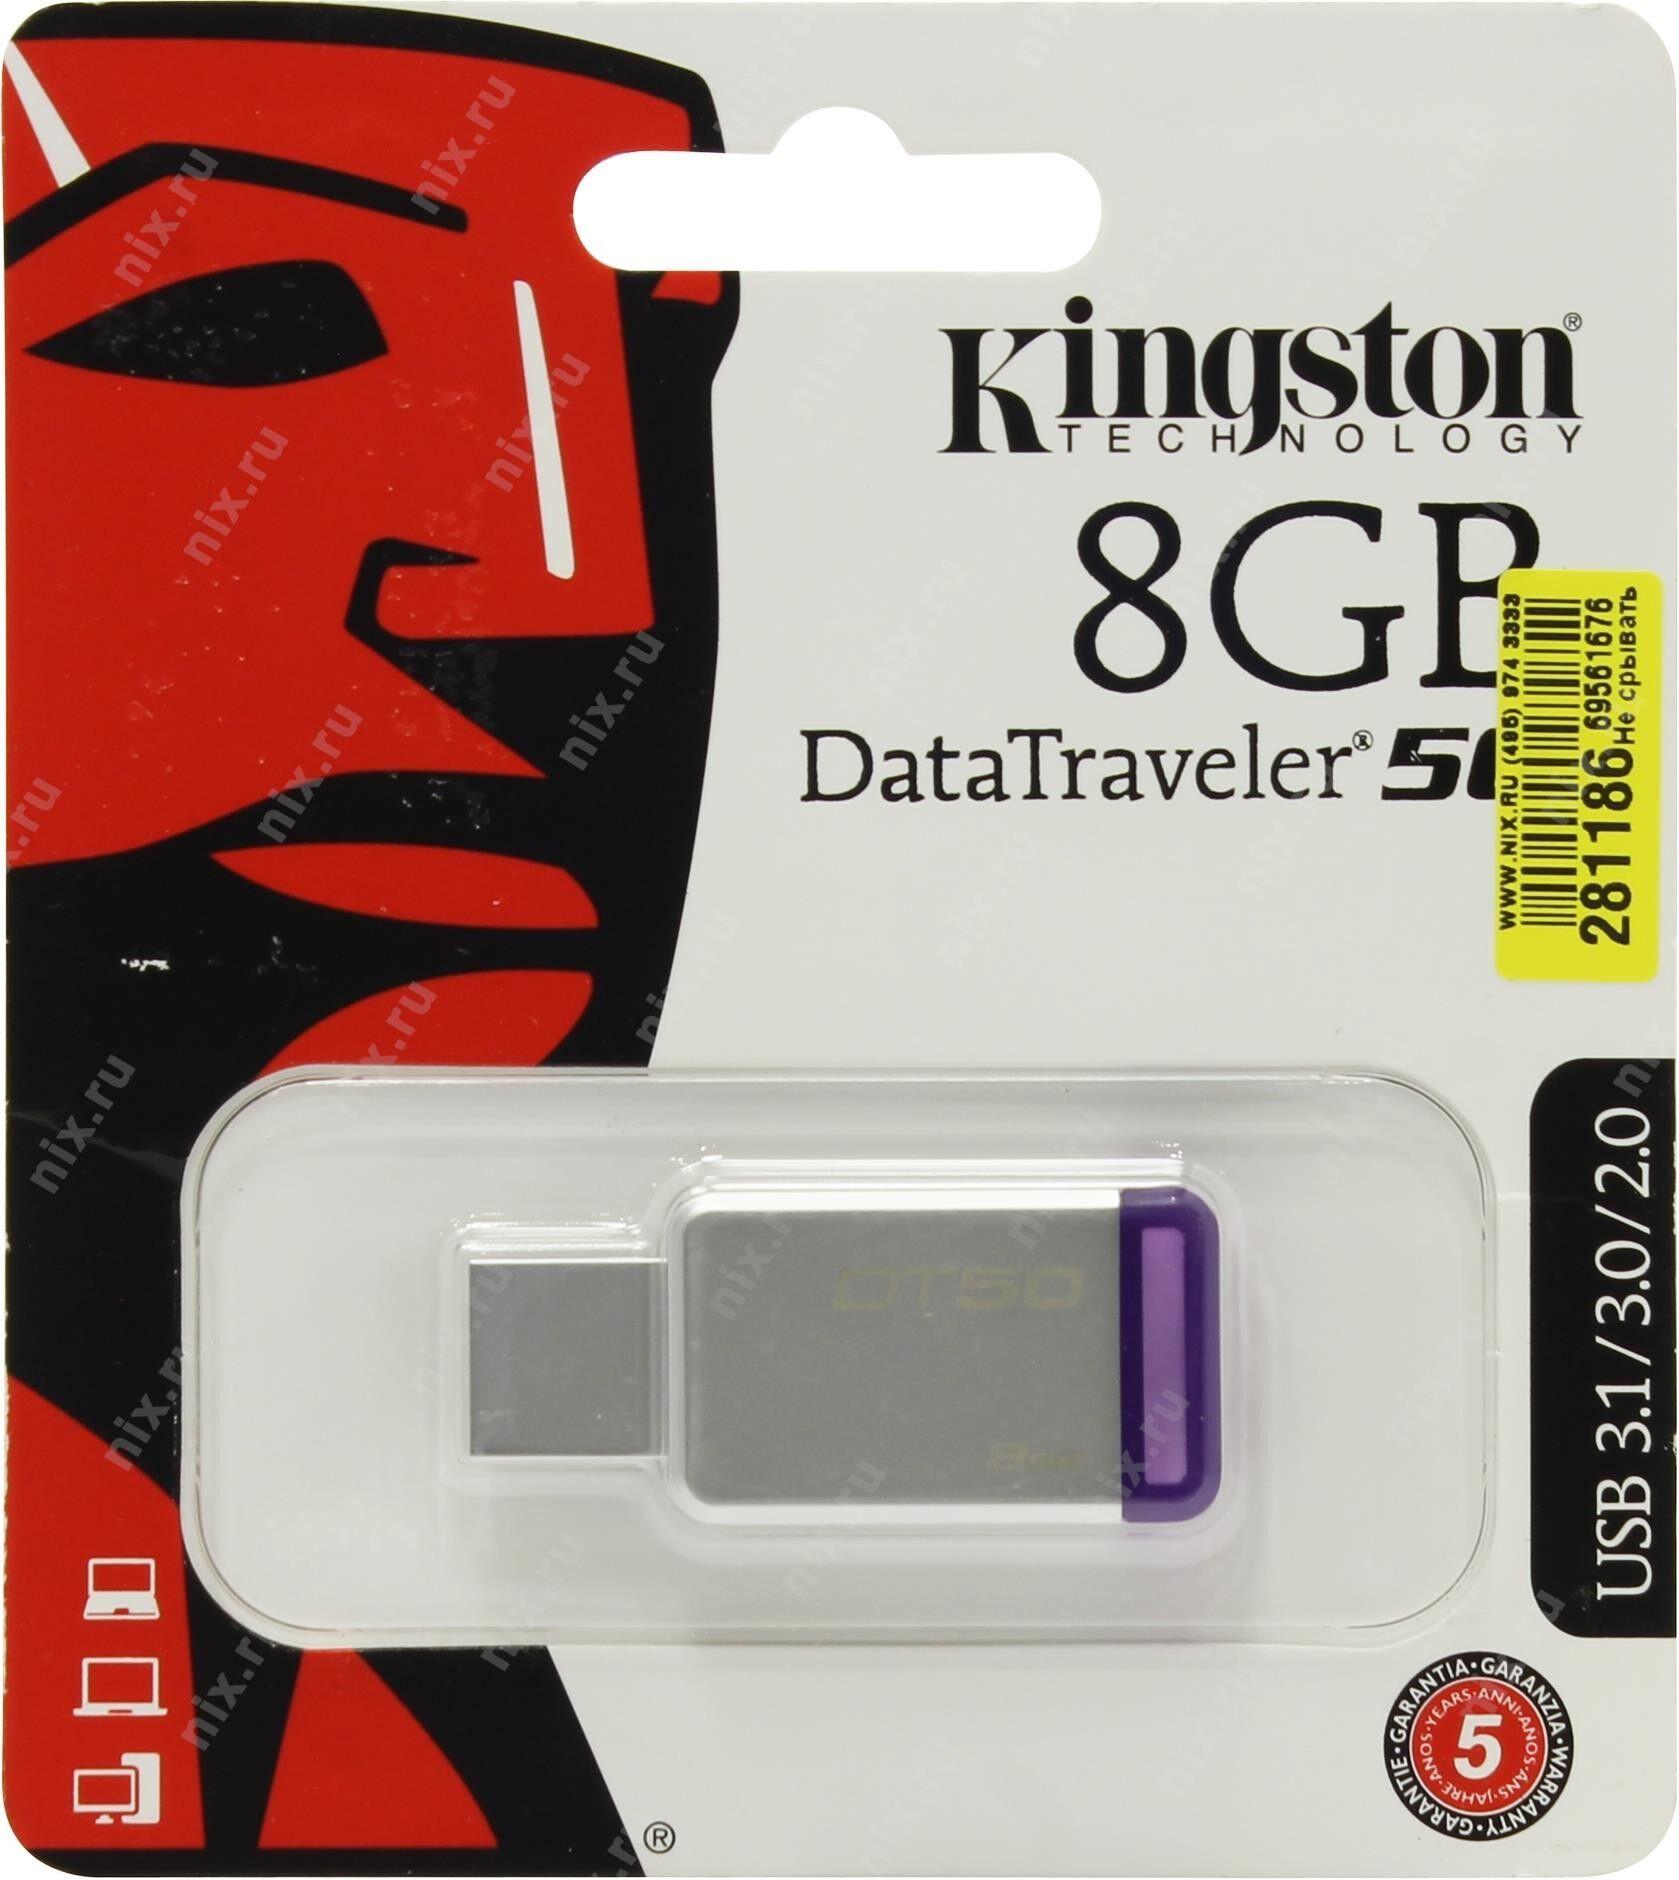 INFORMATICA PENDRIVE 8 GB DATATRAVELER 8 GB DT50 3.1 - USB 3.0 -DT50/8GB-